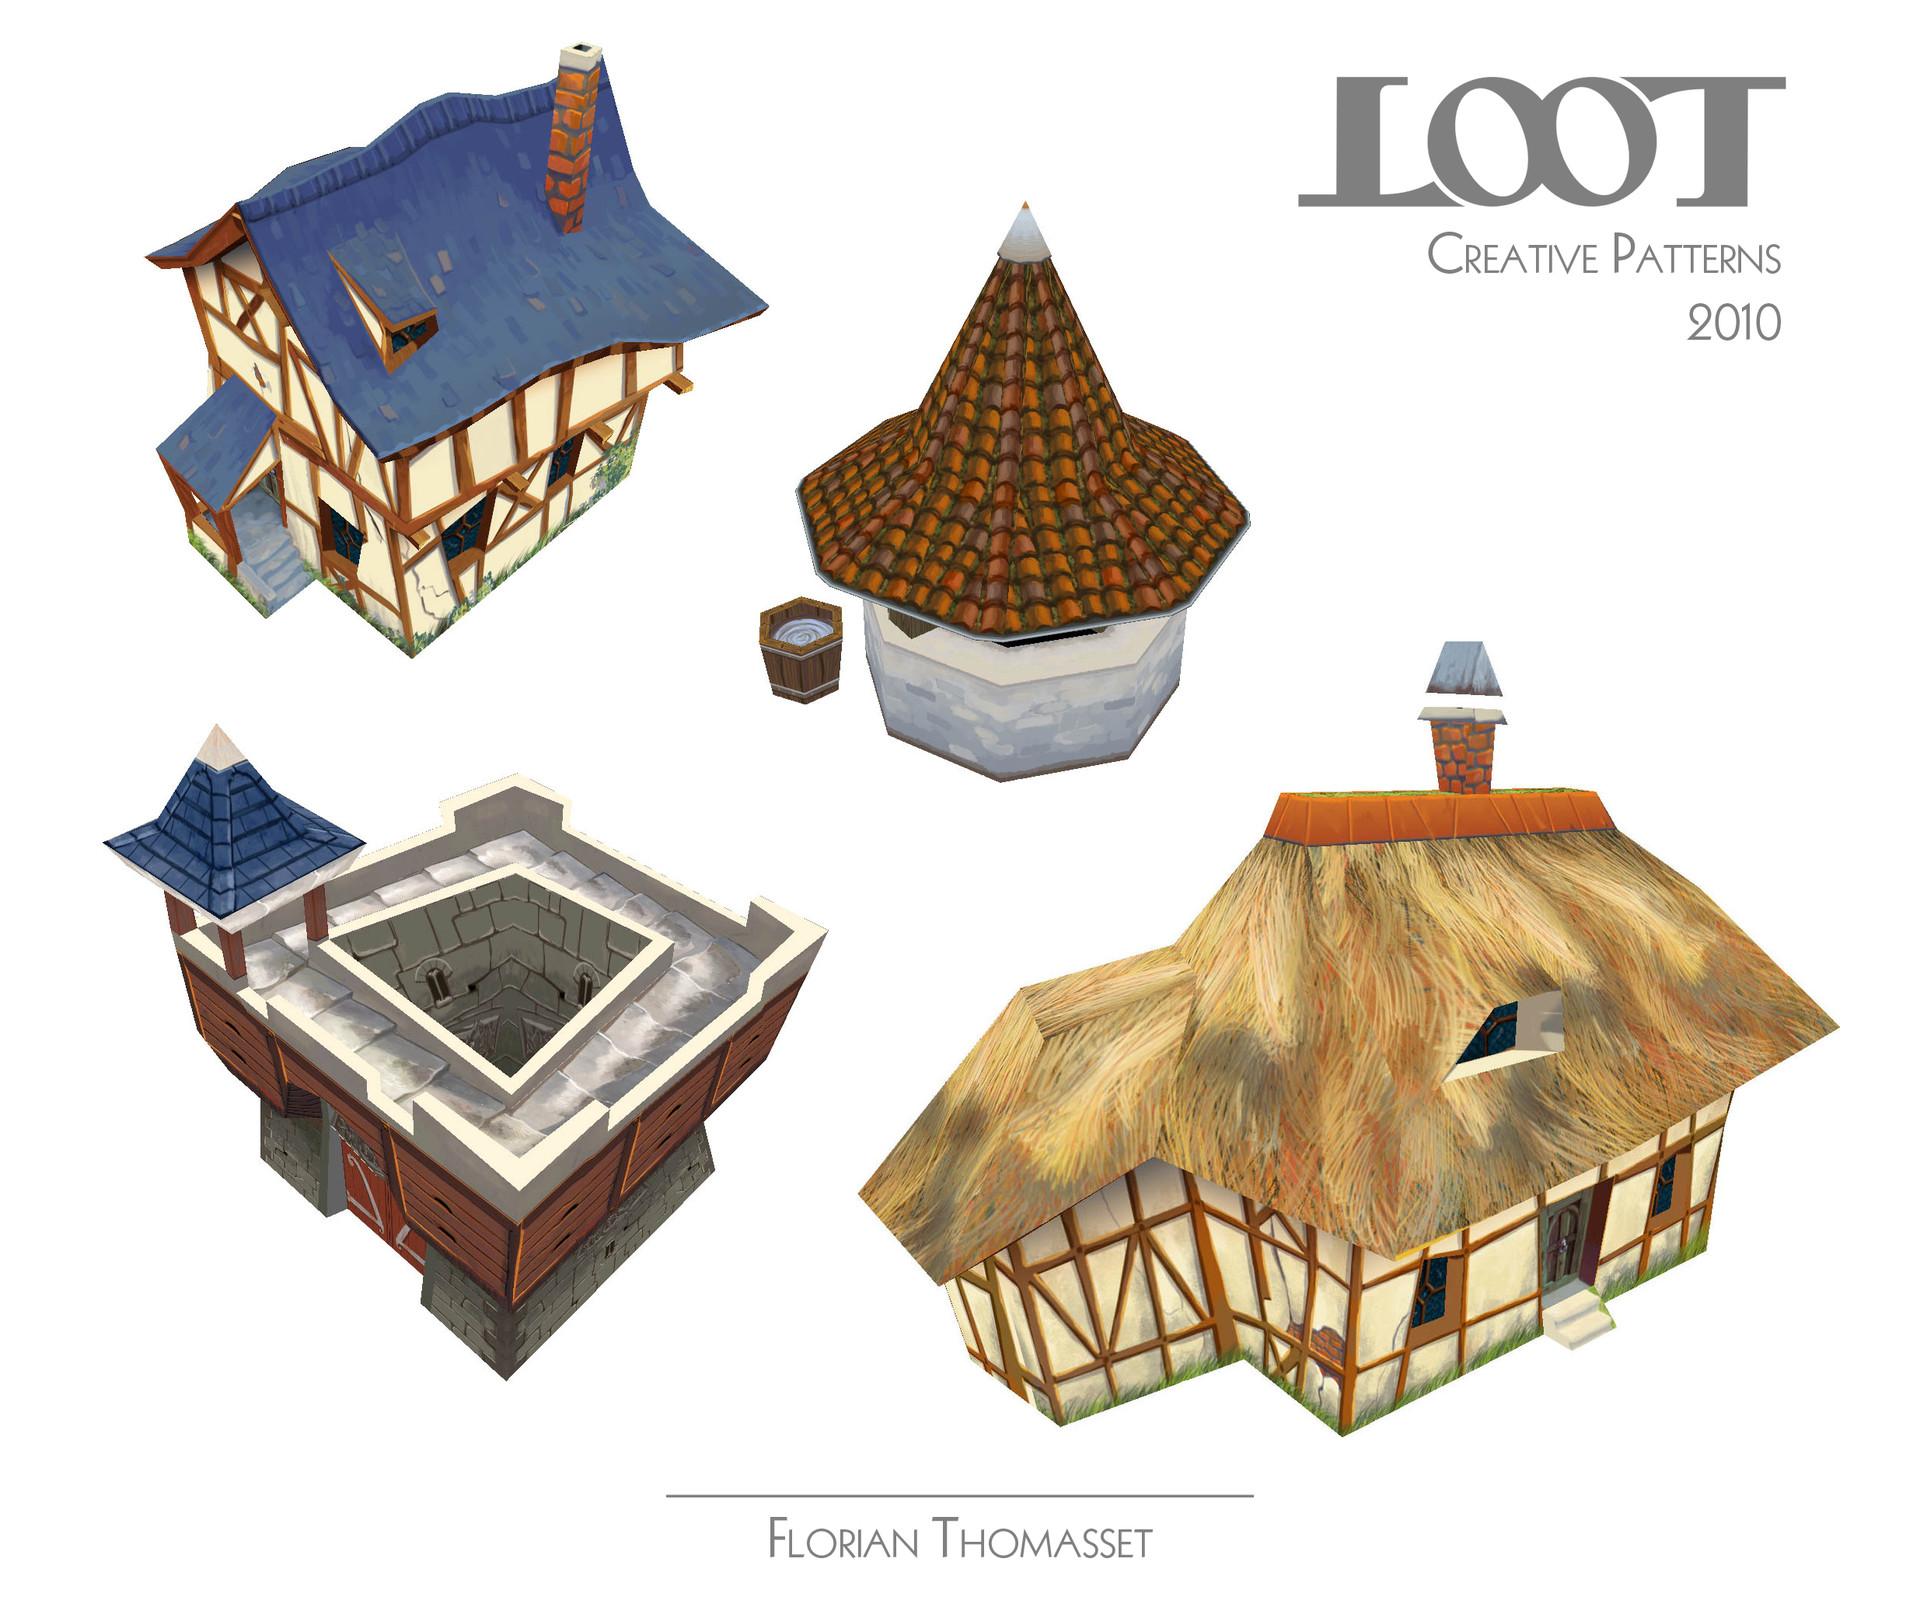 Florian thomasset loot